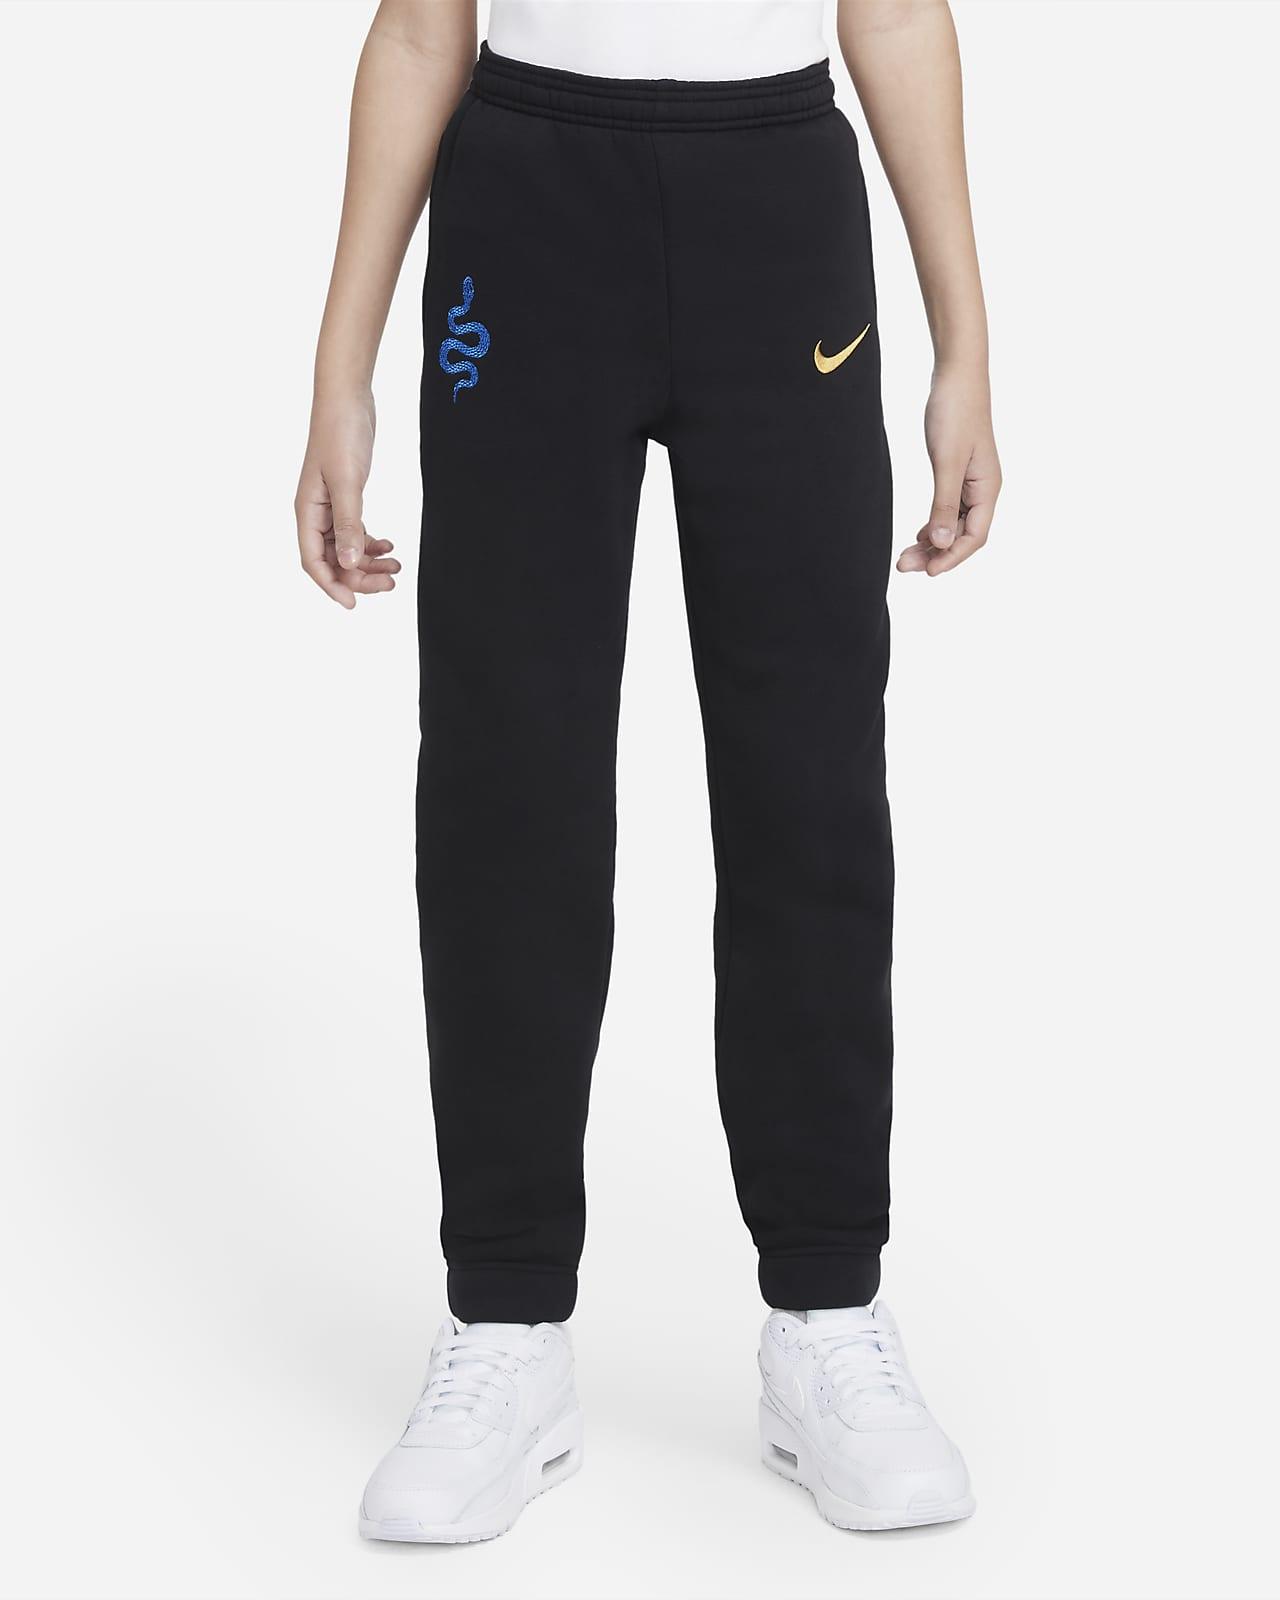 Inter Milan Older Kids' Fleece Football Pants